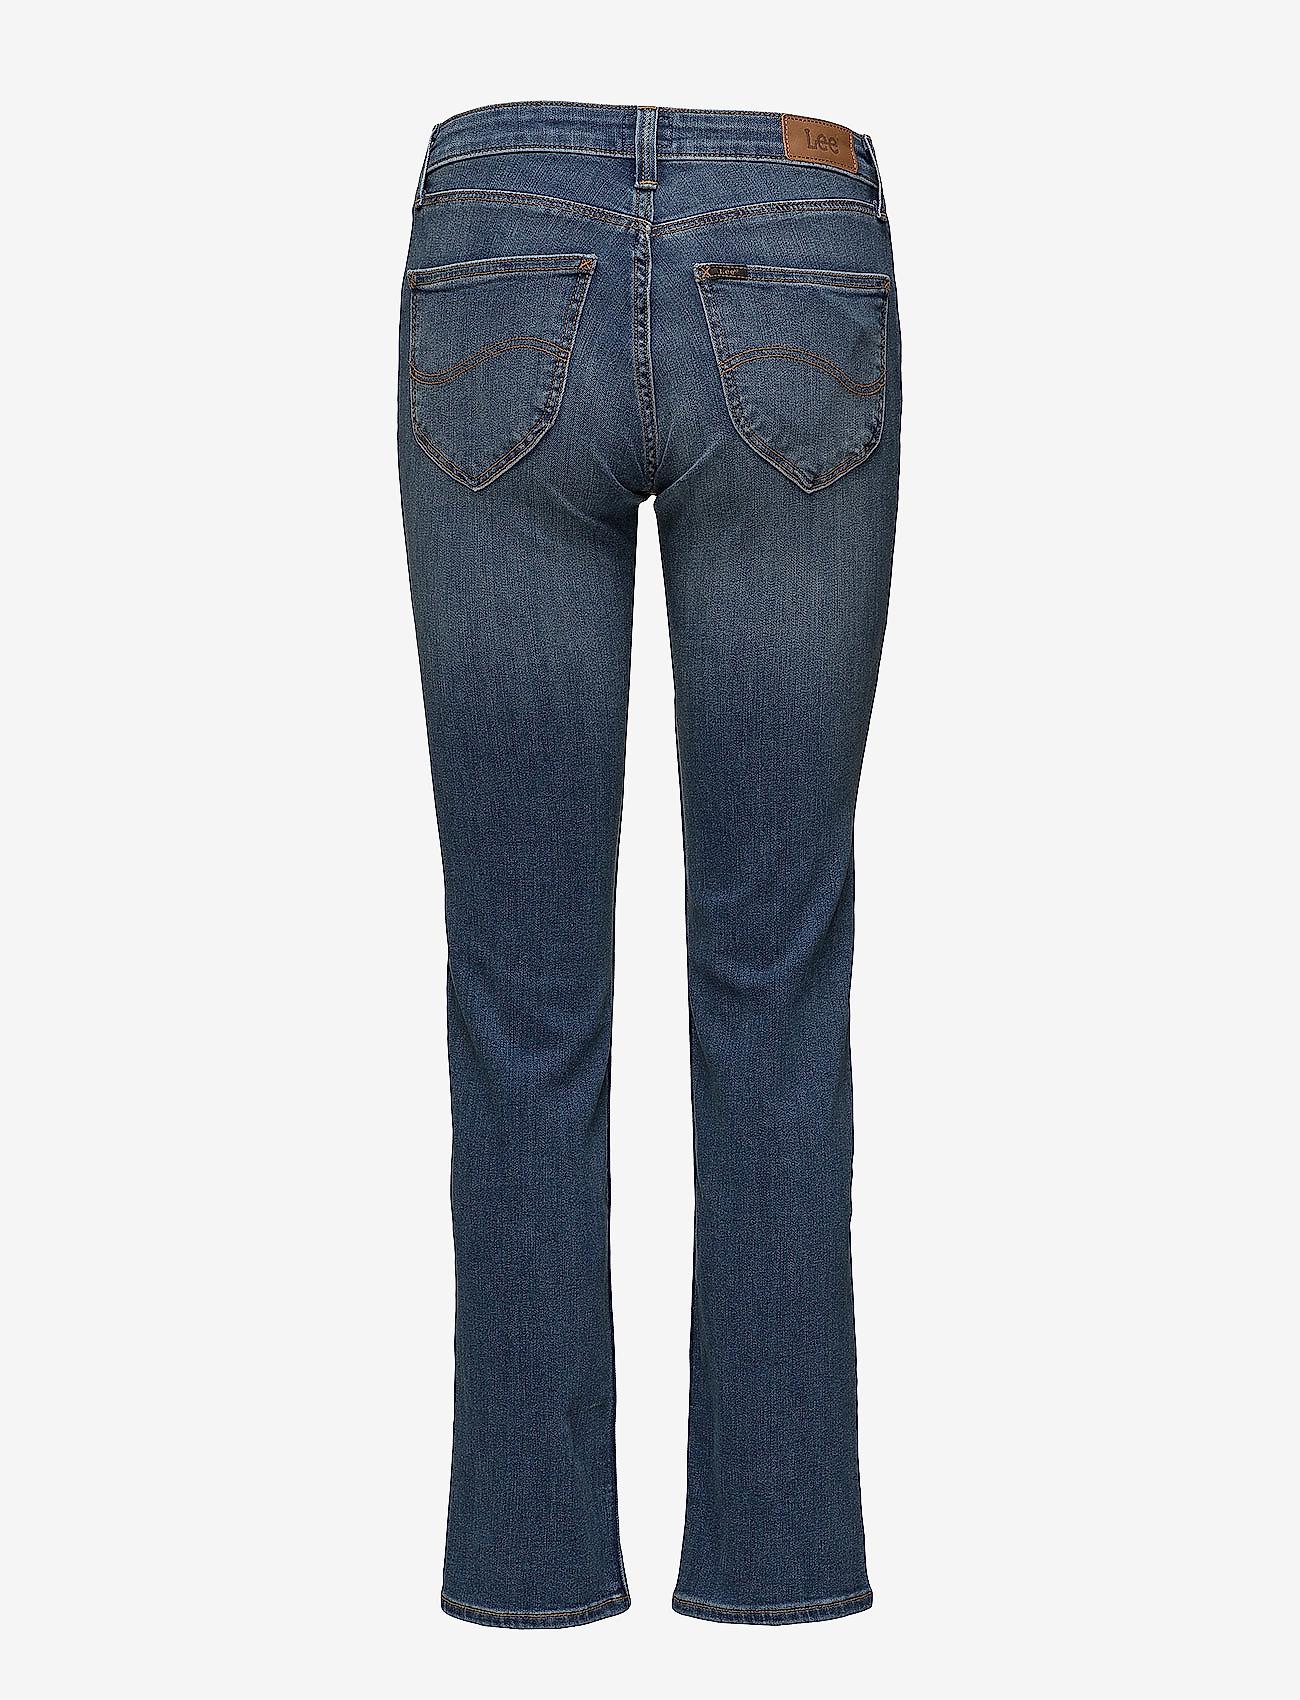 Lee Jeans Marion Straight Ninety Nine -